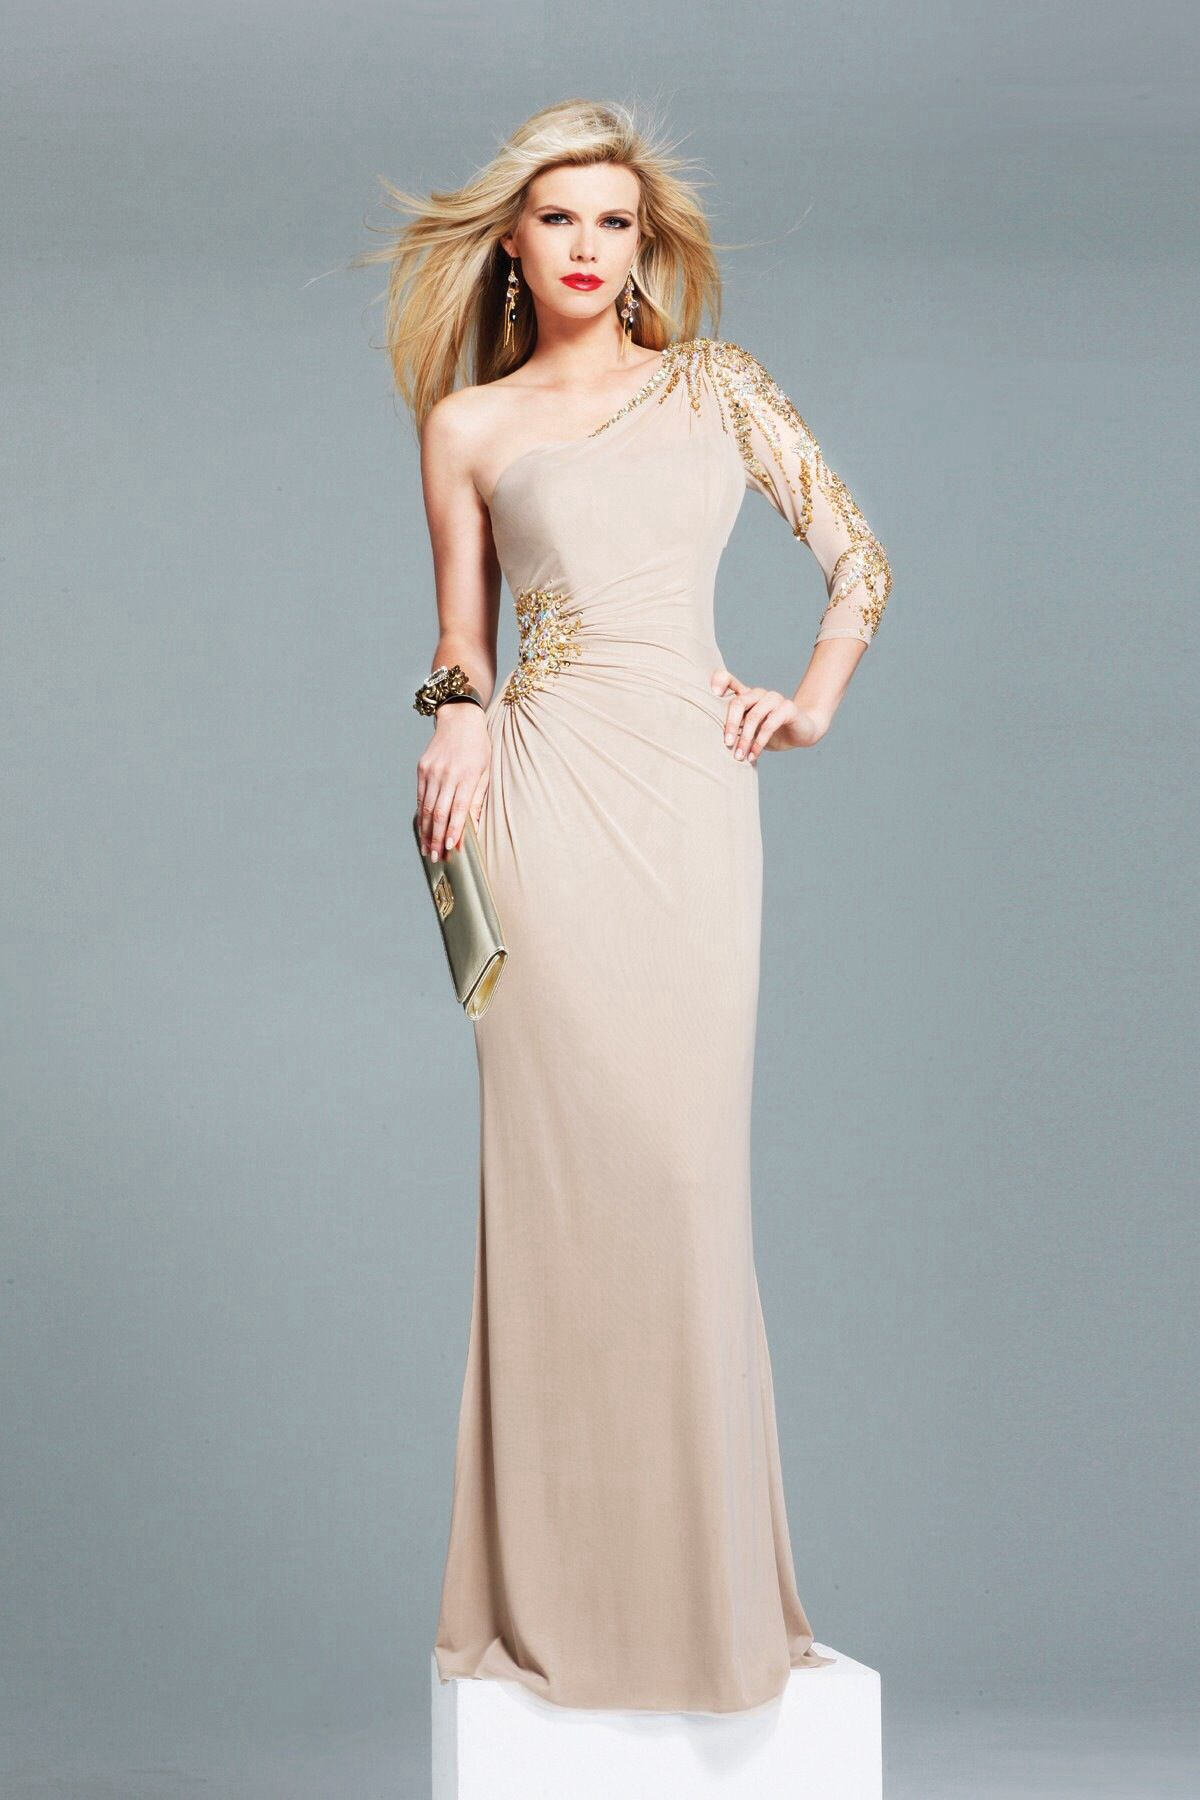 Modern egyptians dress dress pinterest prom and fashion